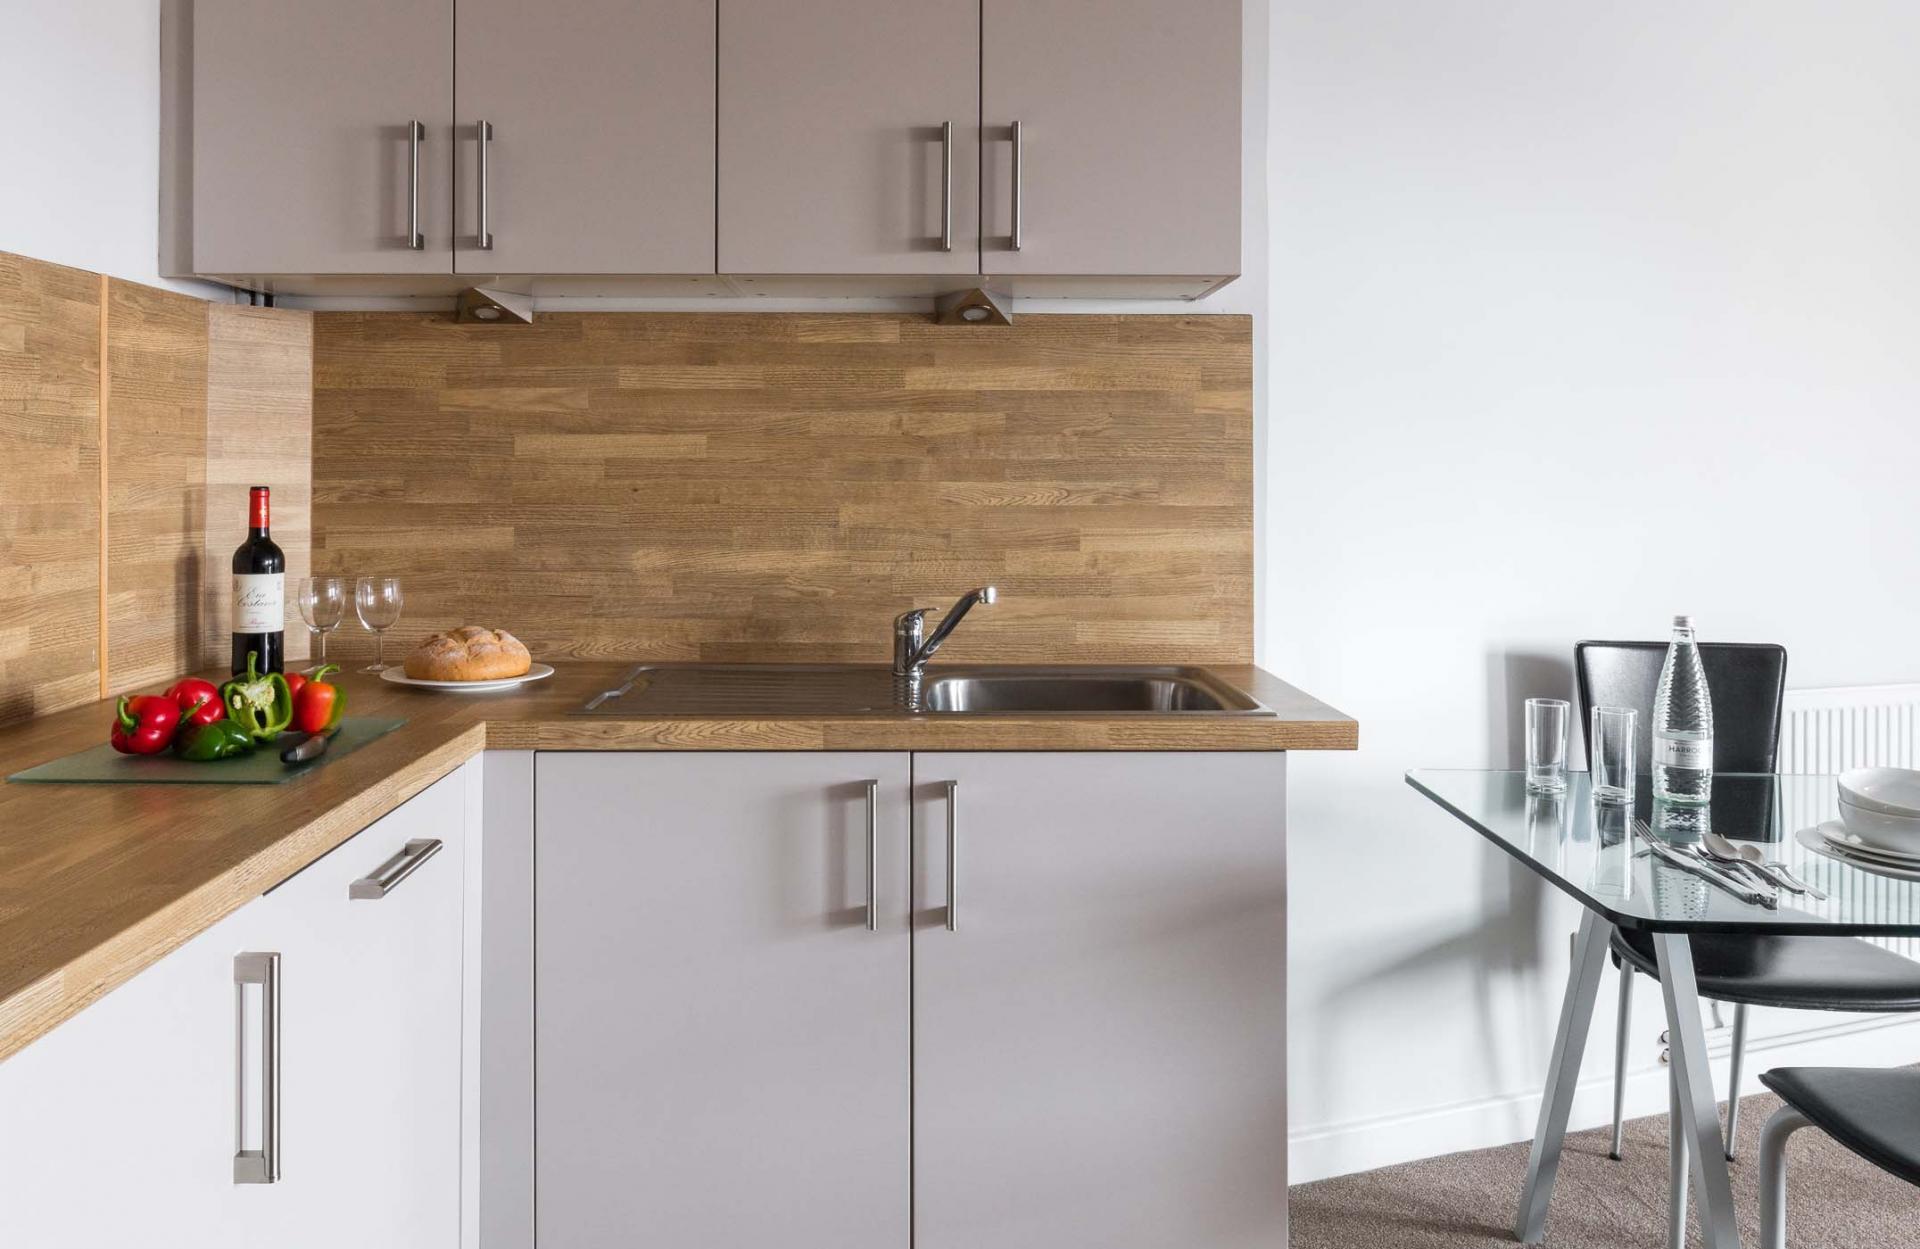 Modern kitchen in SACO Nottingham - The Ropewalk - Citybase Apartments